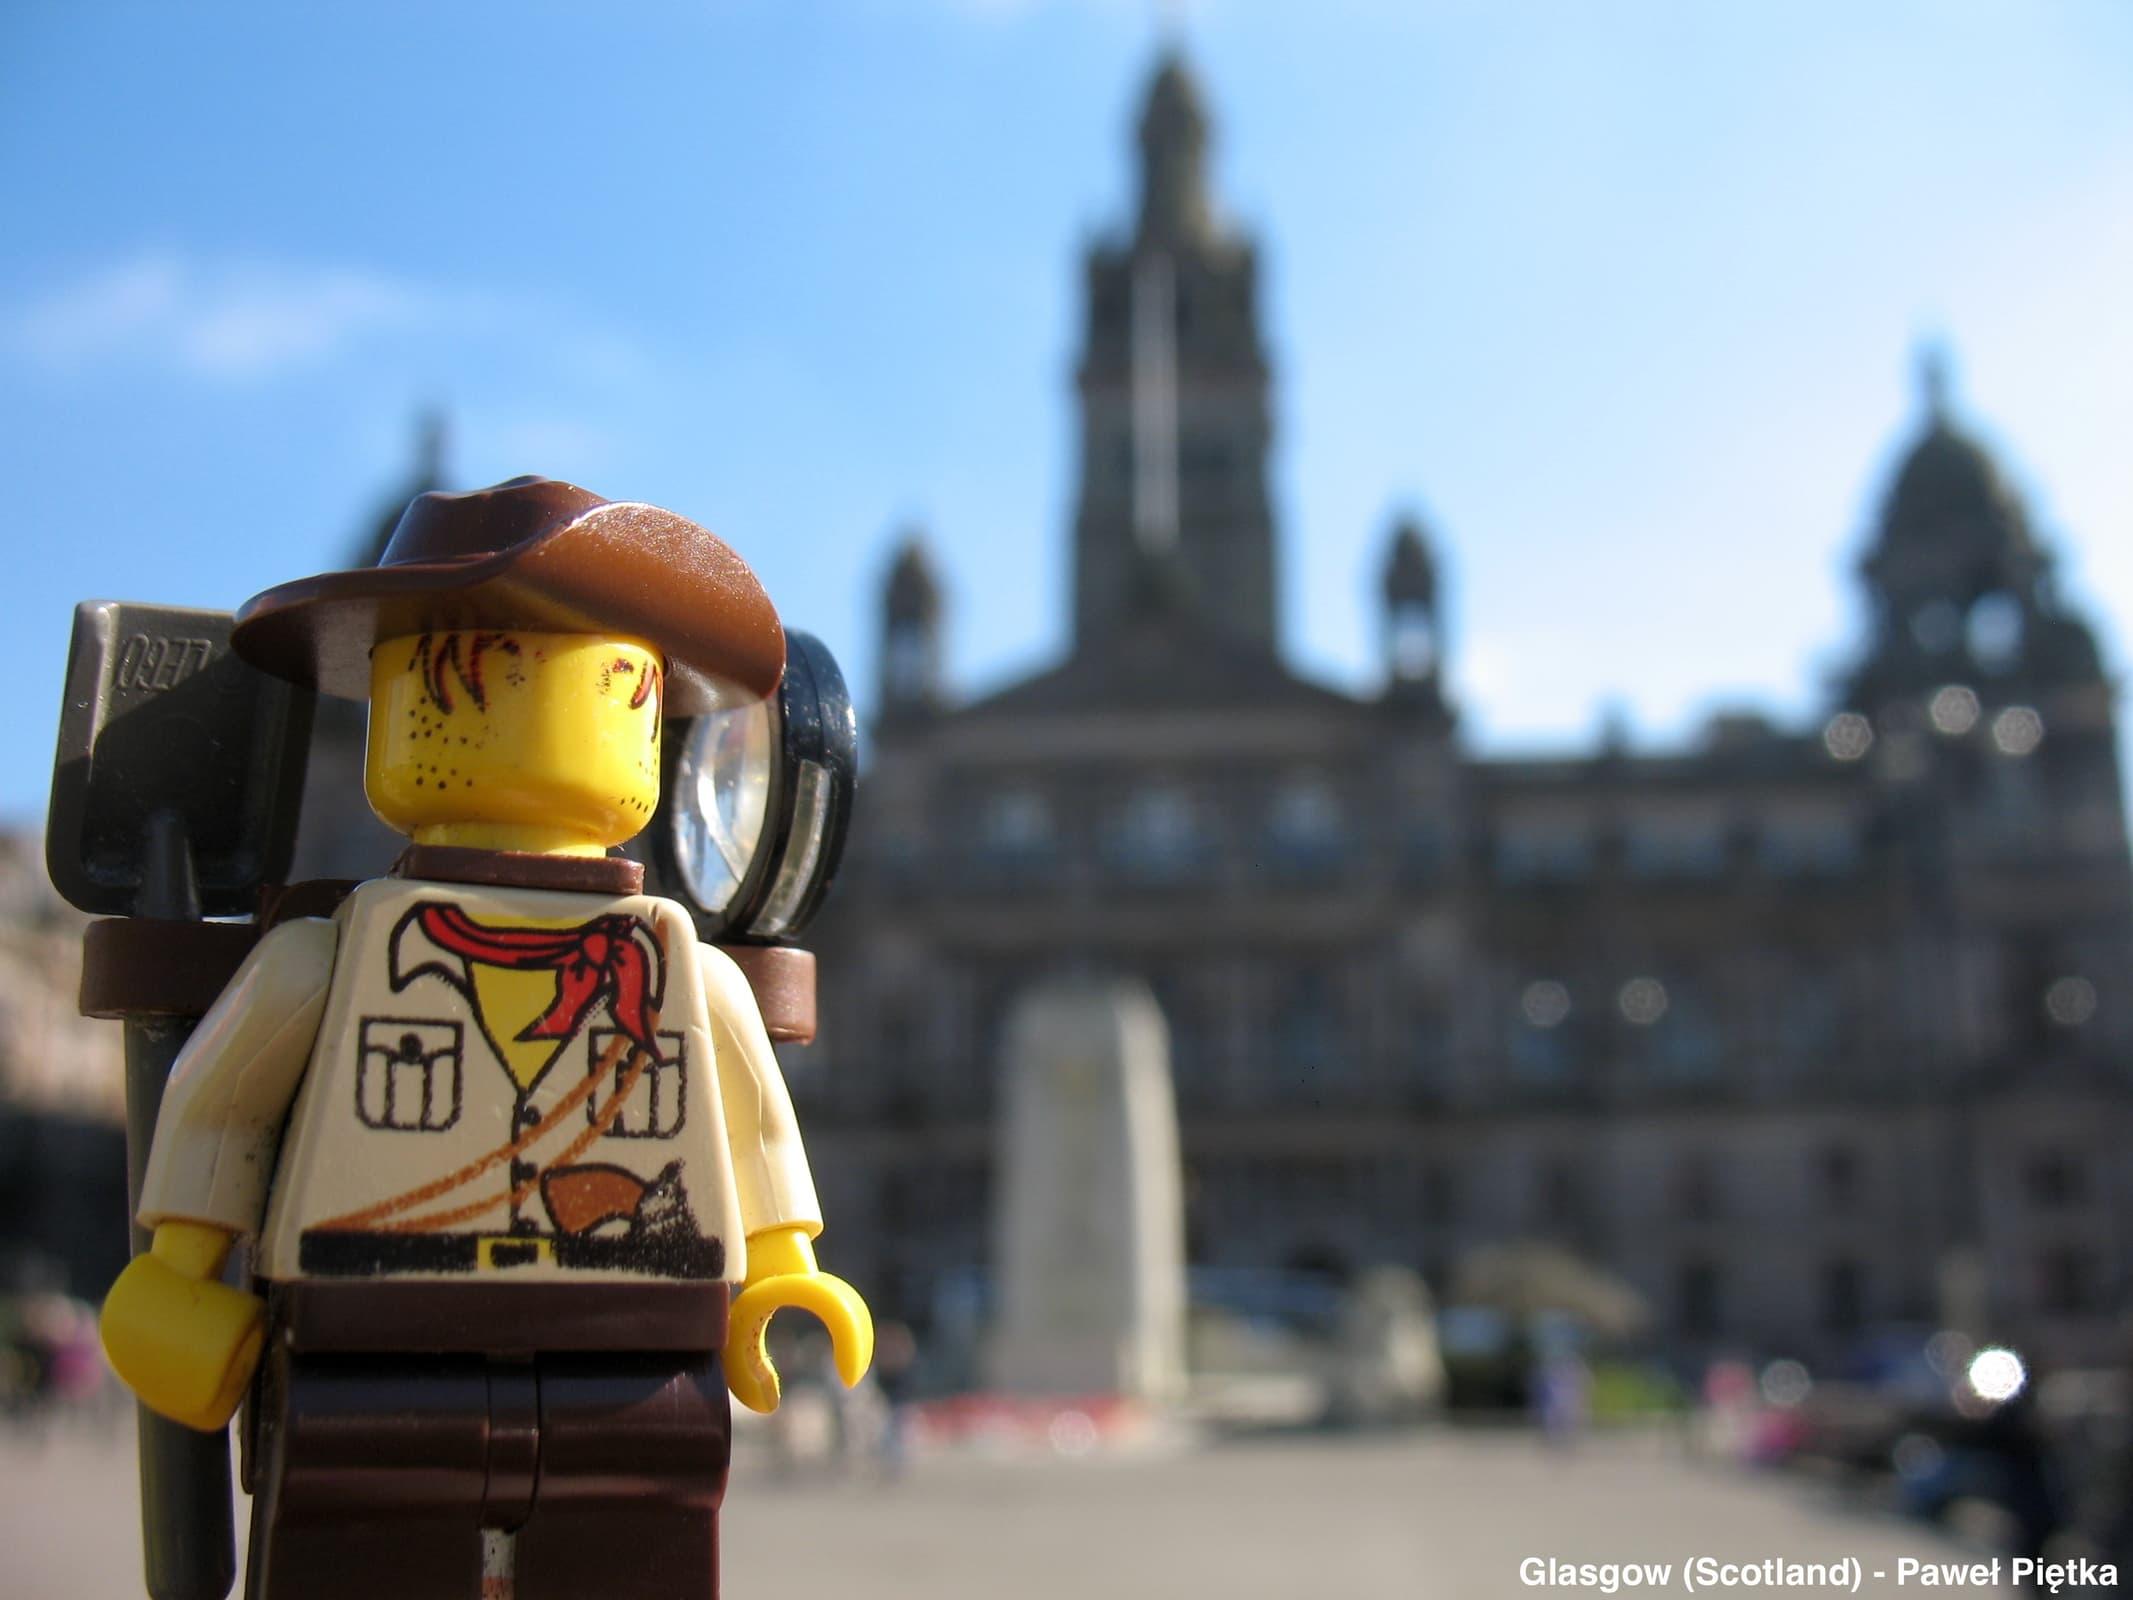 Glasgow (Scotland) - City Chambers George Square